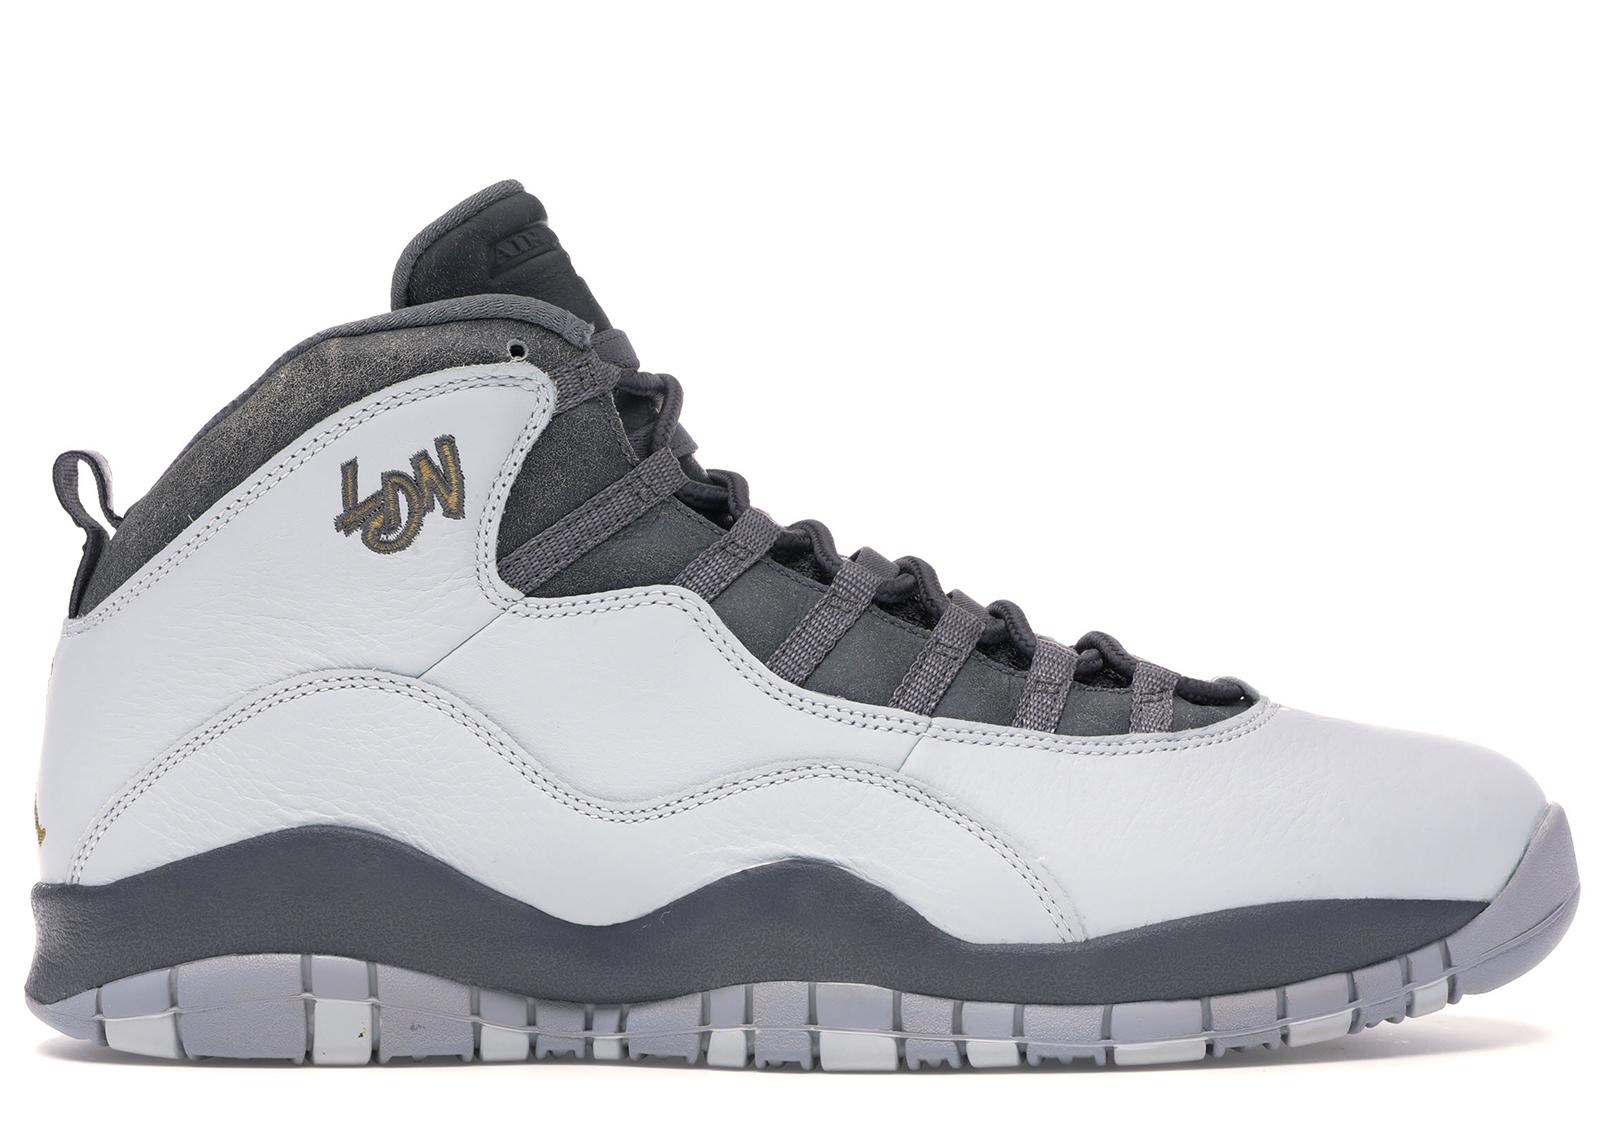 Jordan 10 Retro London - 310805-004